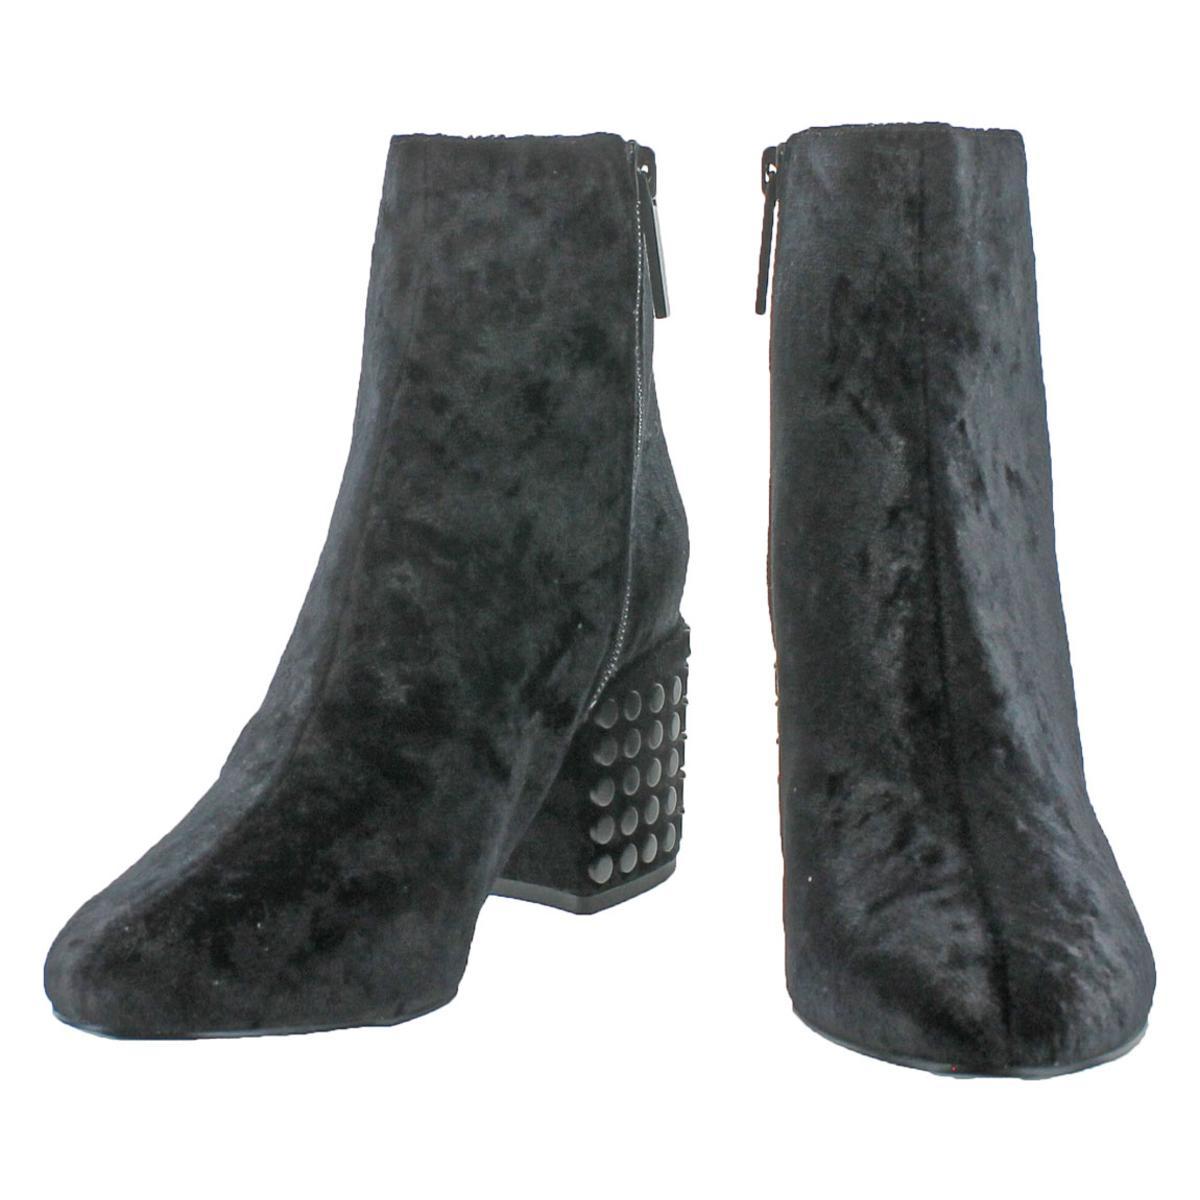 ed5e3522c Kendall + Kylie Blythe Women s Ankle High Block Heel Boots